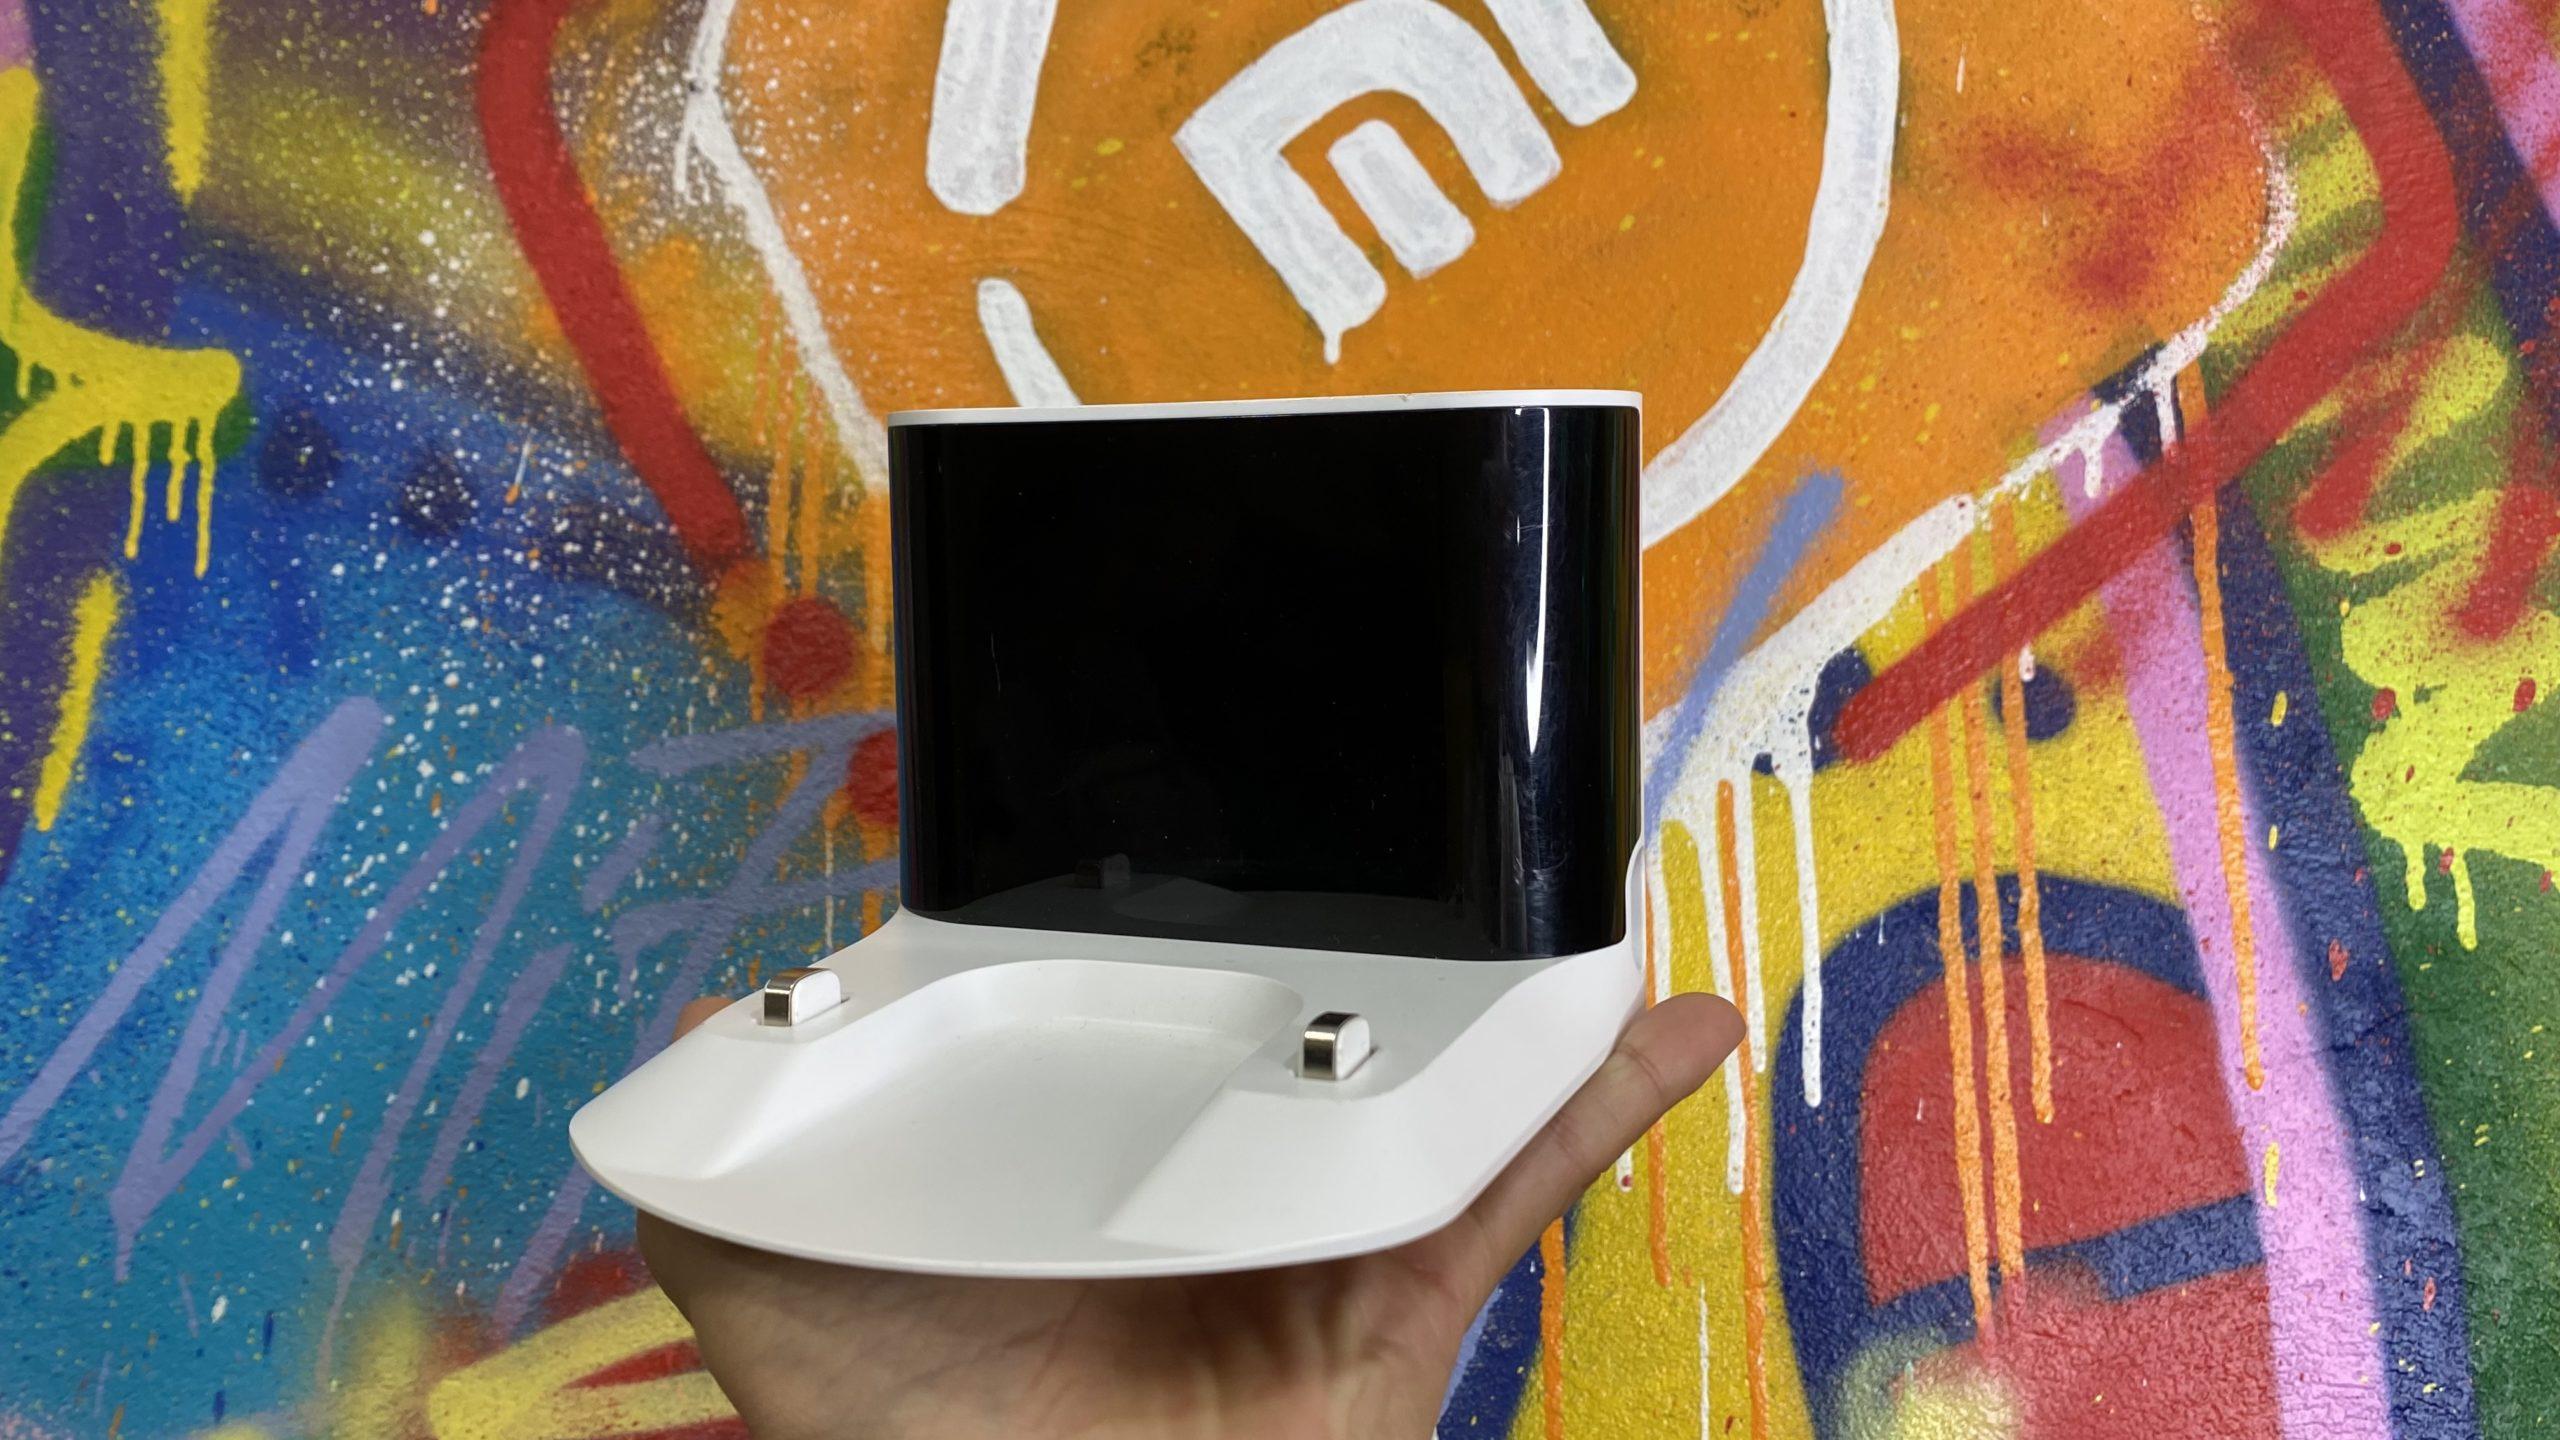 Док станция Xiaomi Mi Roborock Sweep One S50 – S55 (CDZ02RR)